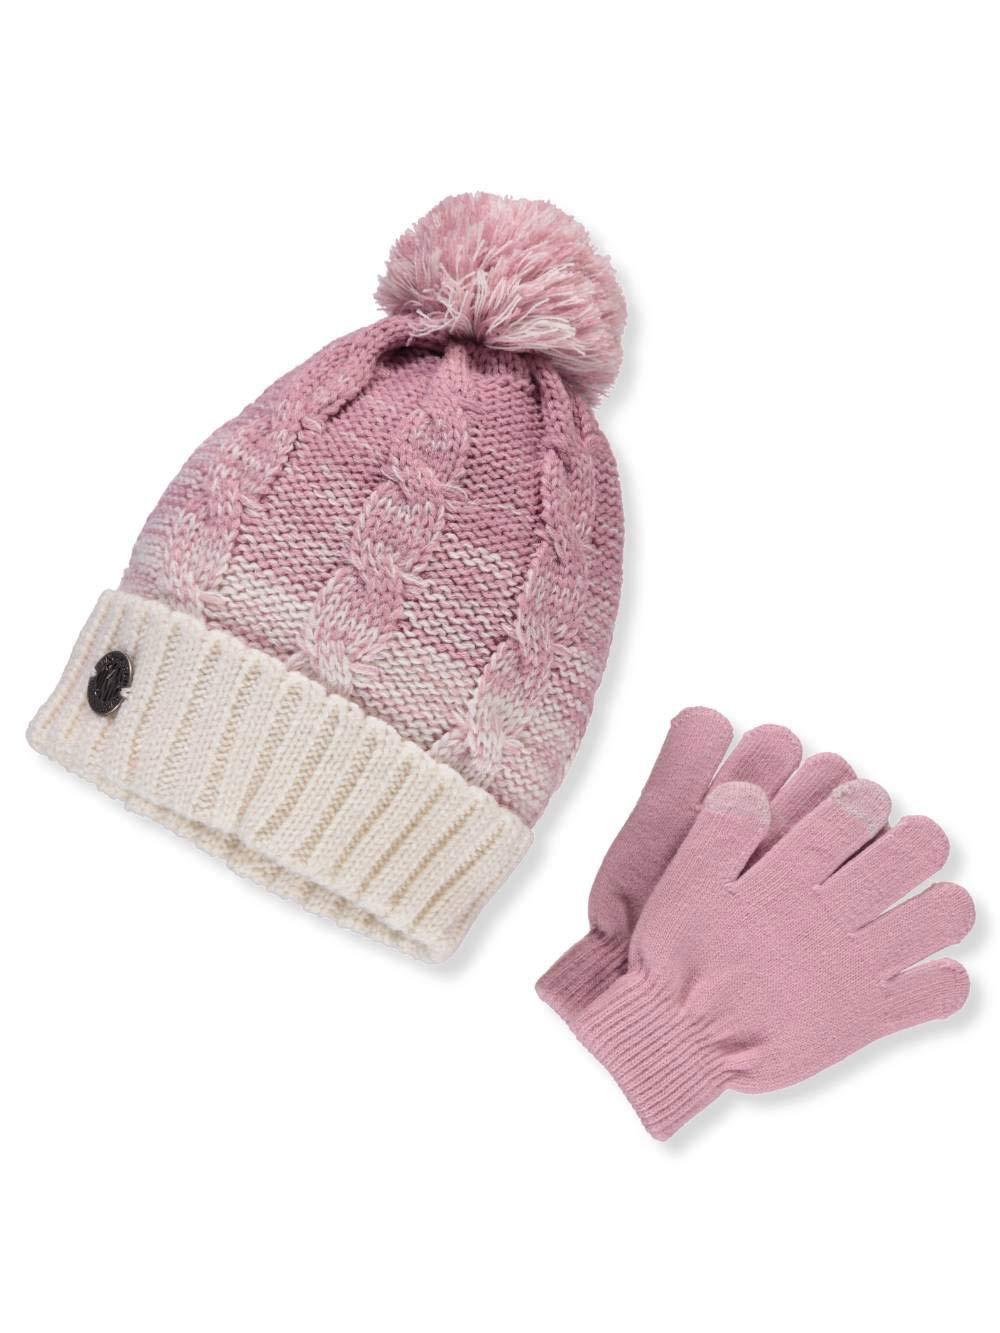 DKNY Girls' Beanie and Gloves Set - Off White, 7-16